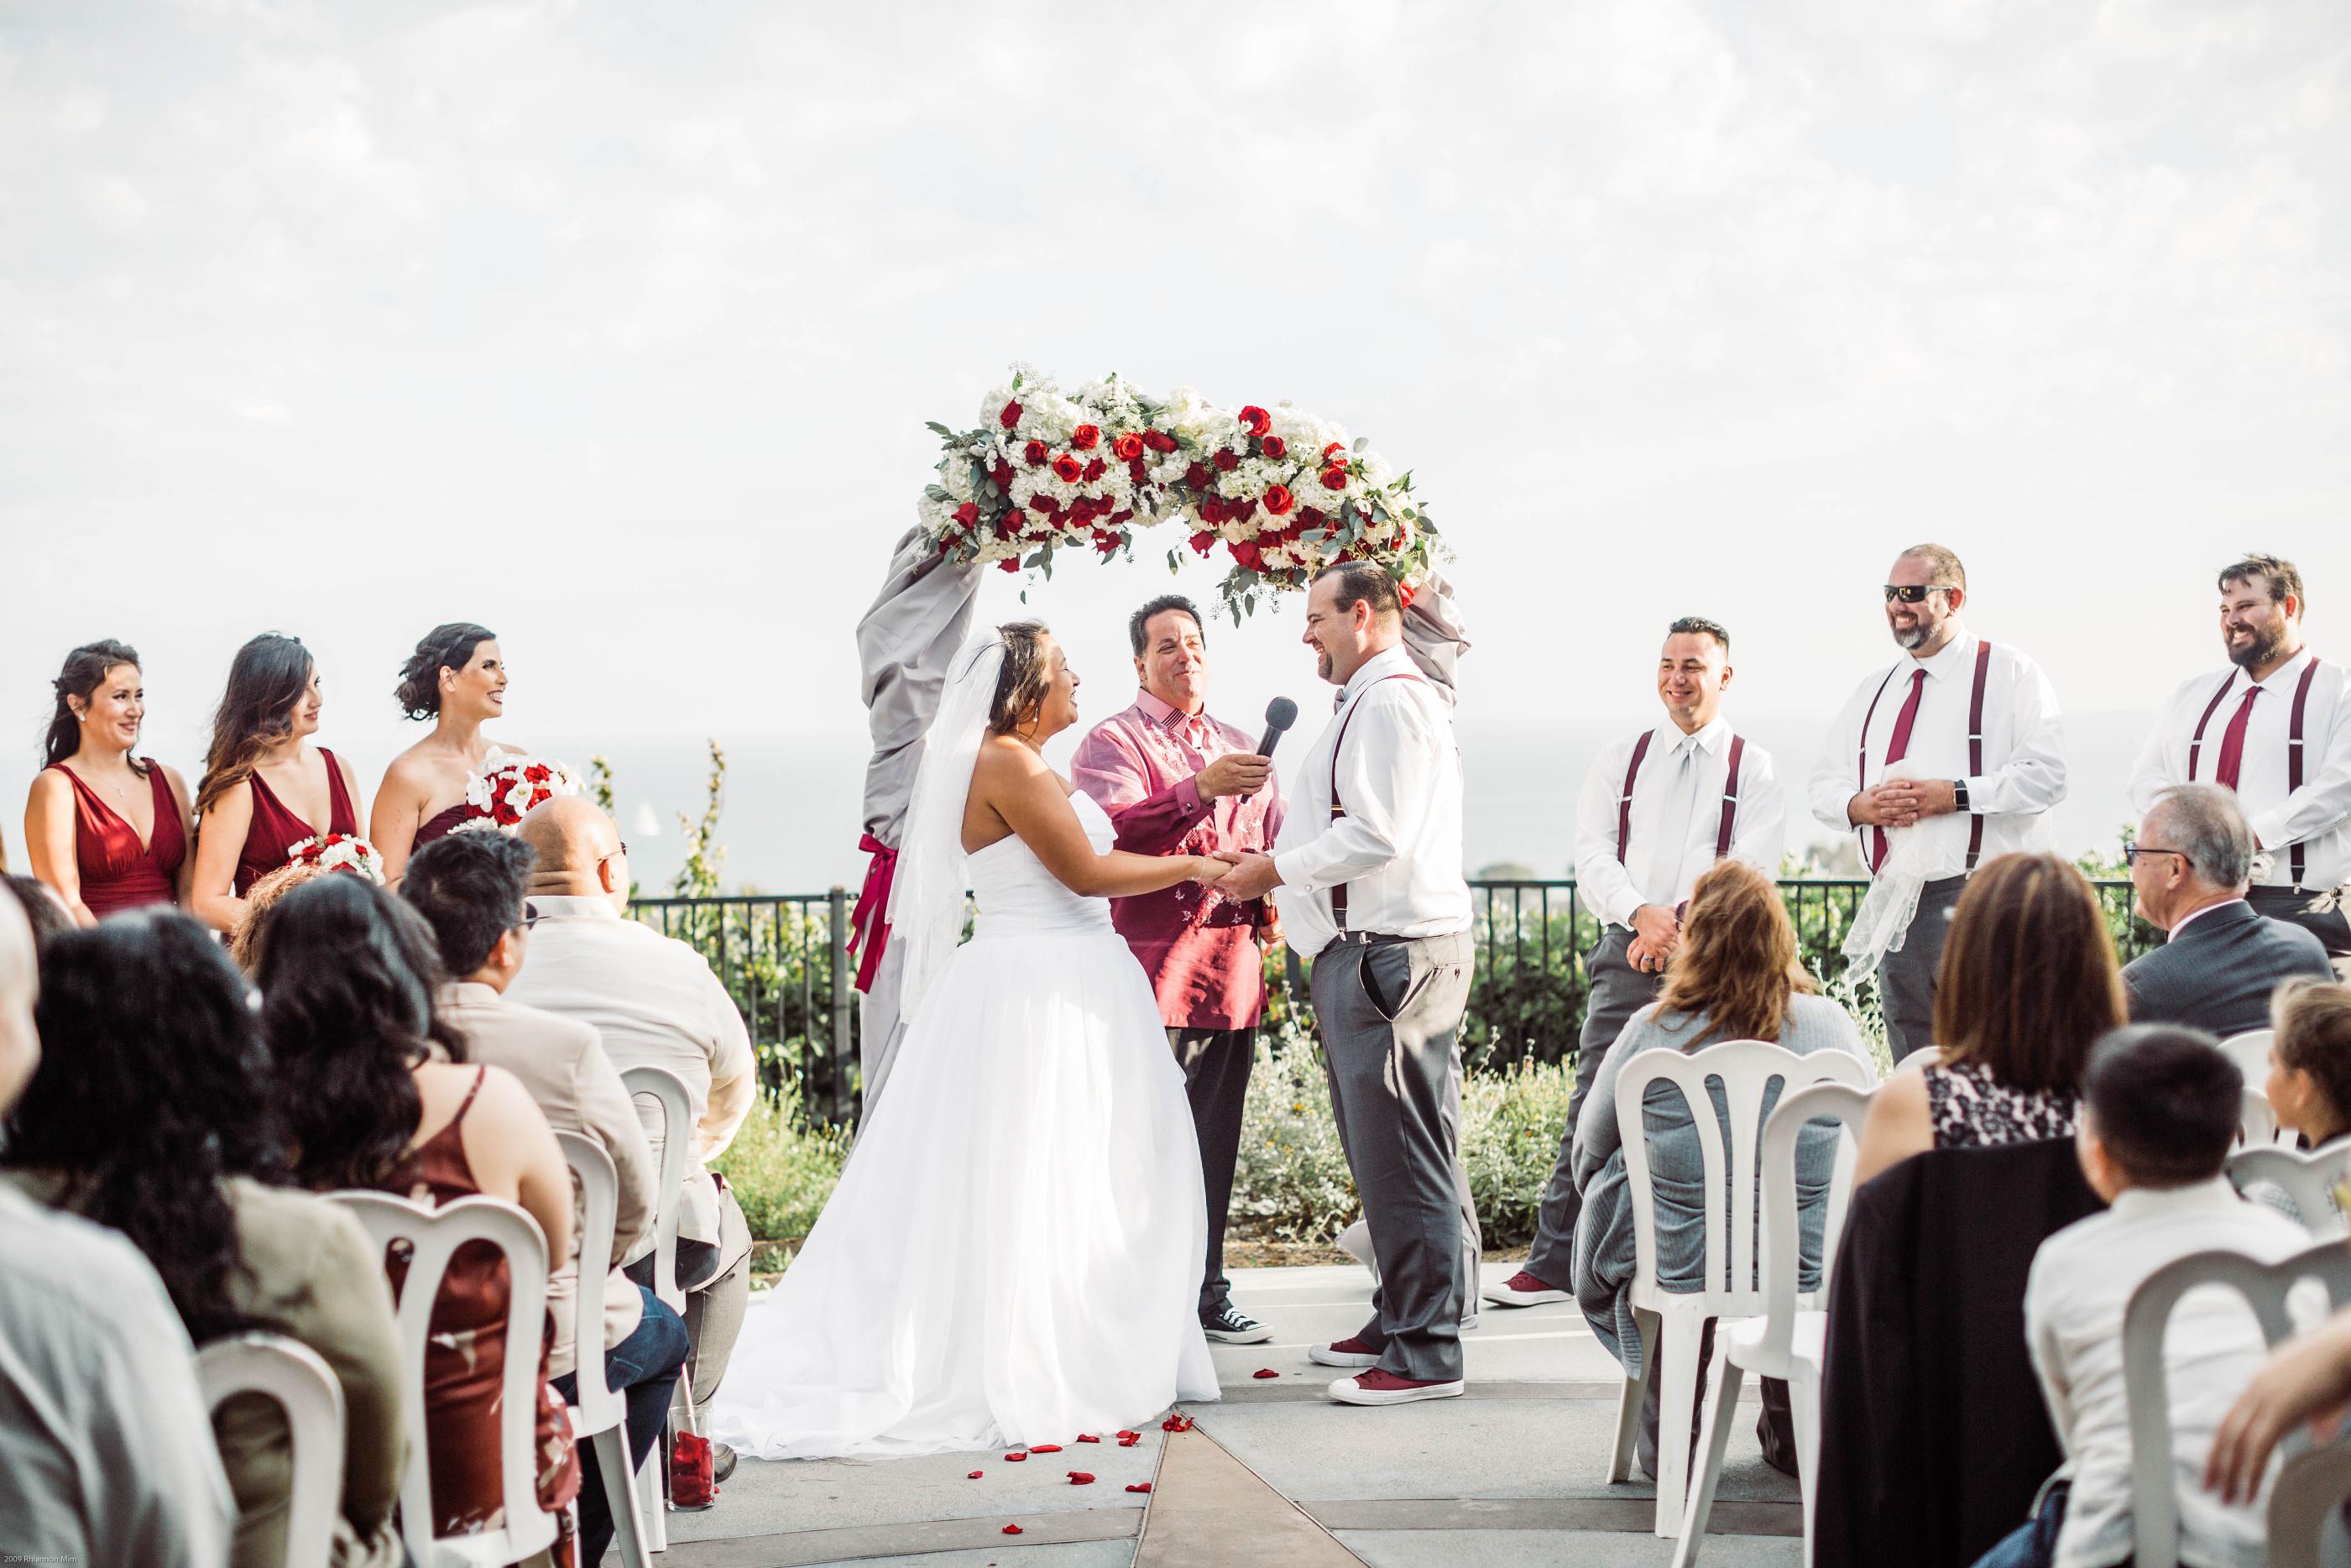 20170909_Wedding_0837